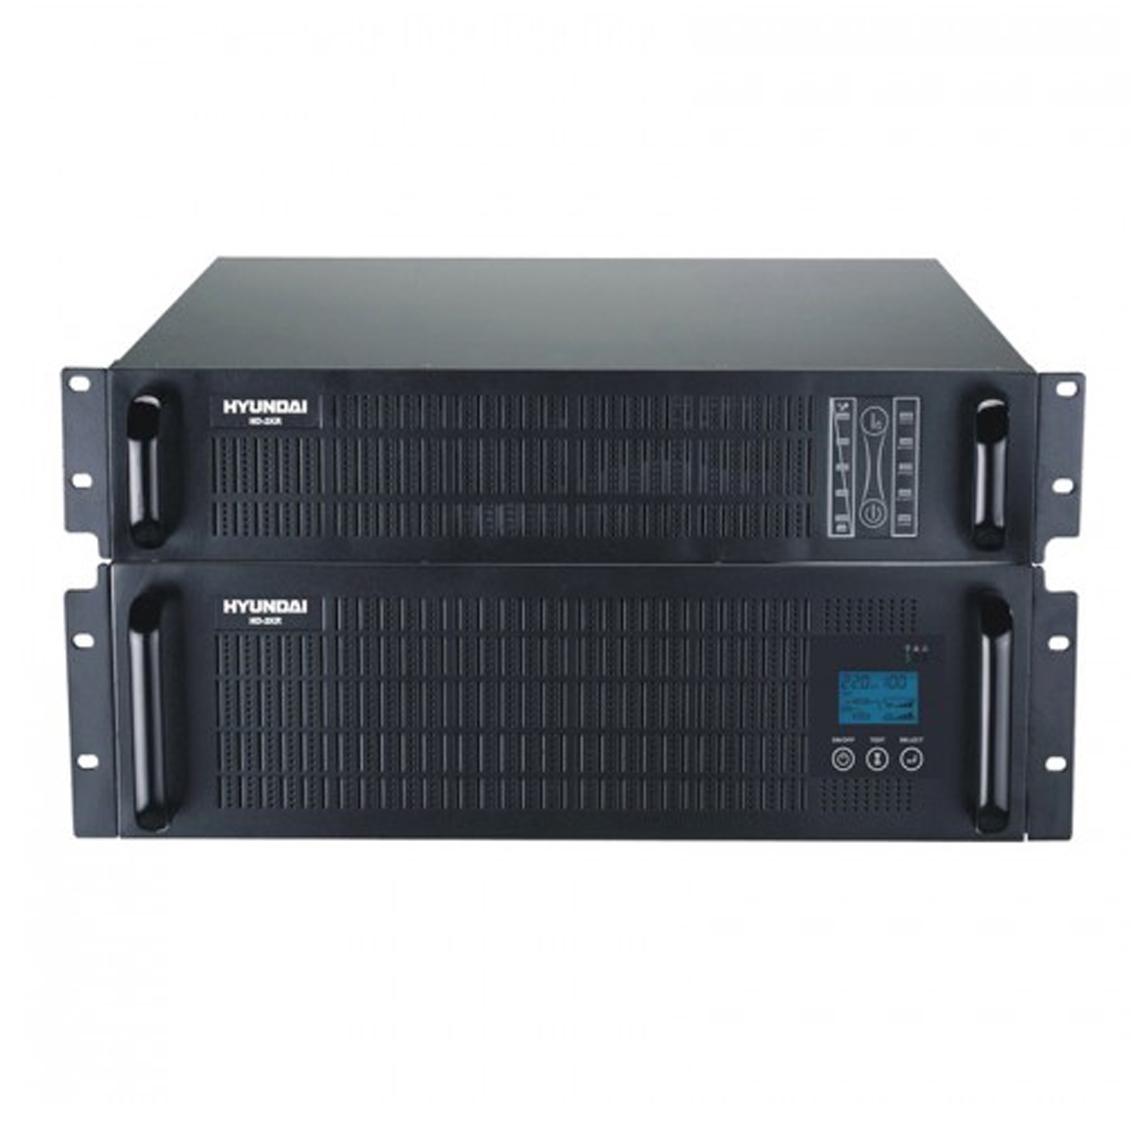 UPS Rack Online 1KVA Hyundai HD-1KR